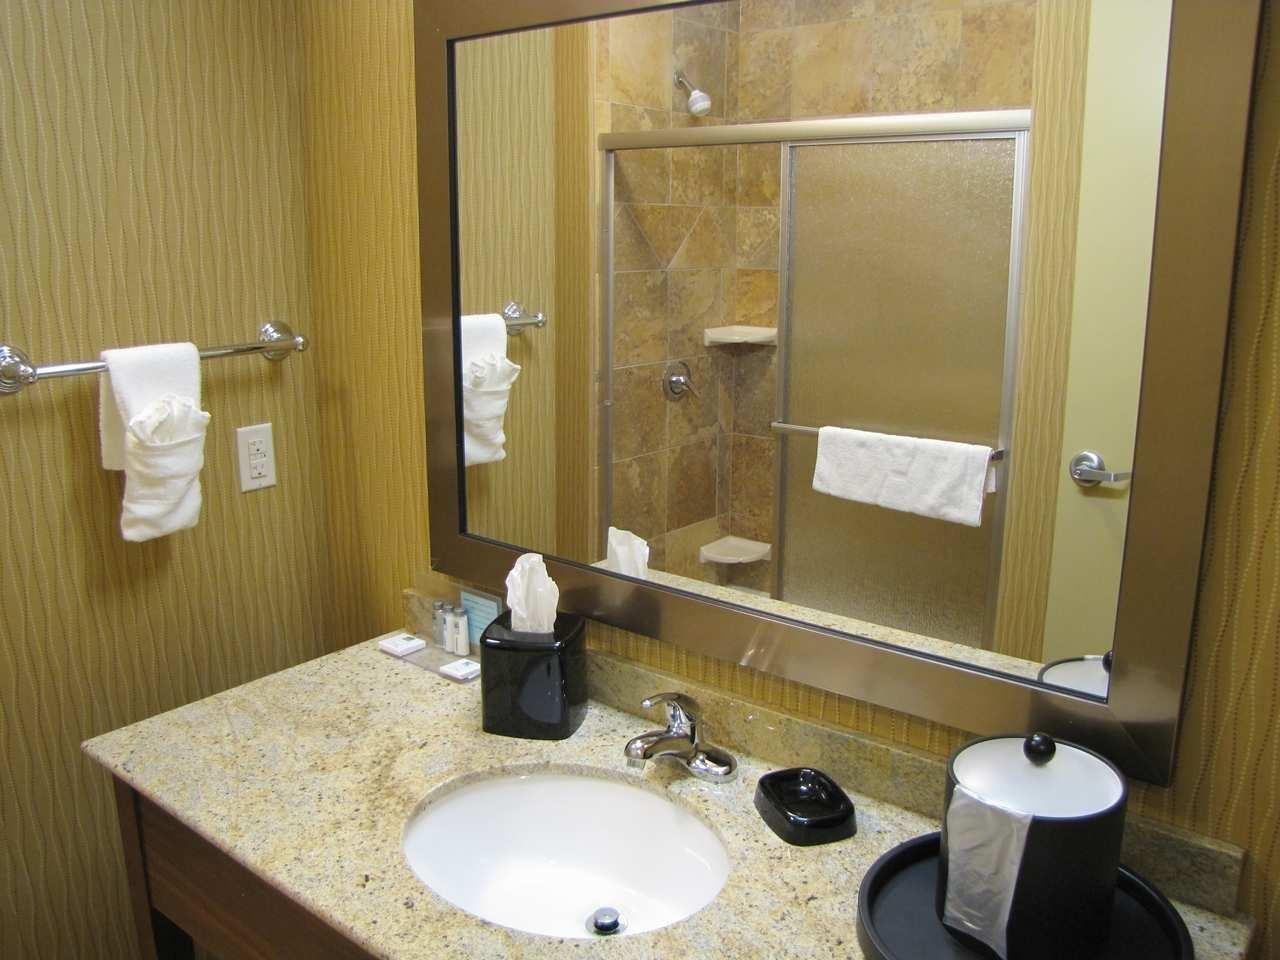 Hampton Inn & Suites Jamestown, ND image 8